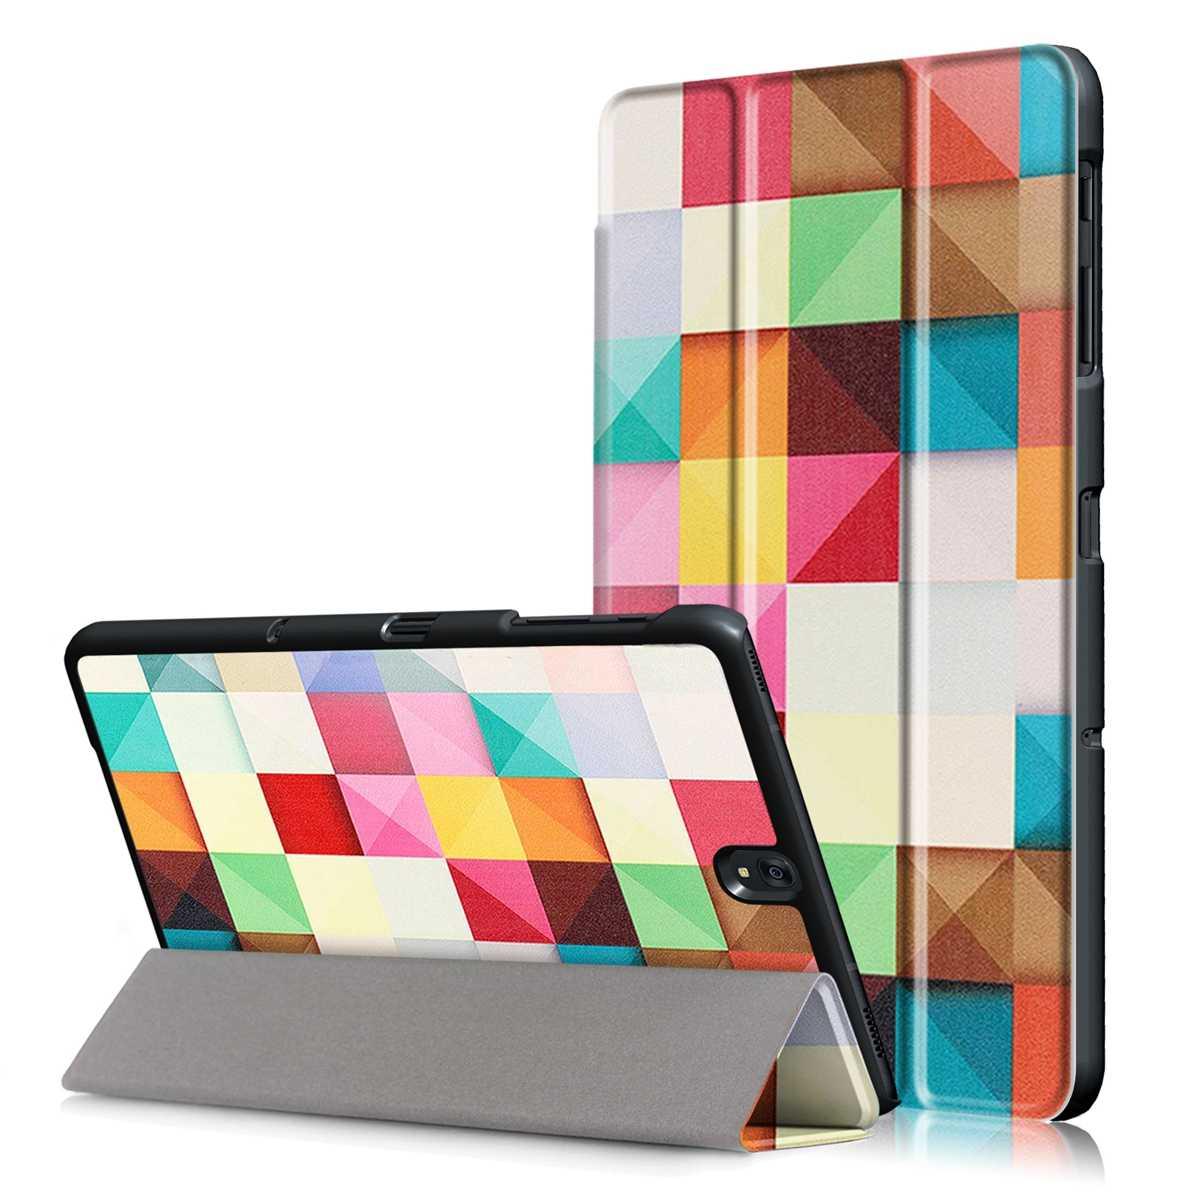 CASEWIN Tri-Vouw PU Leather Tabletten gevallen Voor Samsung Galaxy Tab S3 9.7 T820/T825 Stand Tablet Case met Auto Wake/Sleep